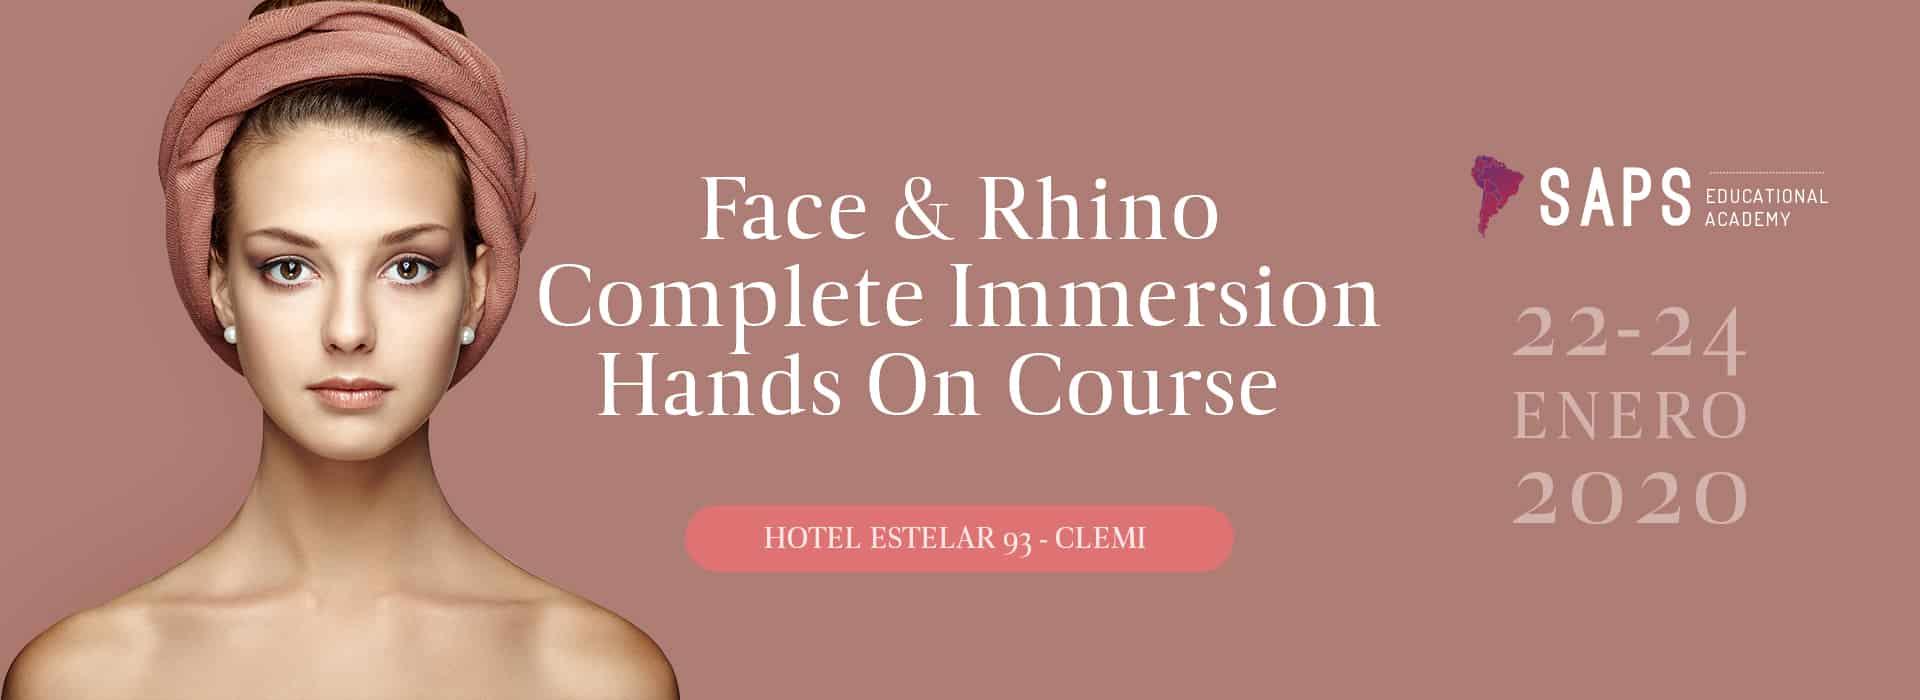 Face & Rhino SAPS Academy